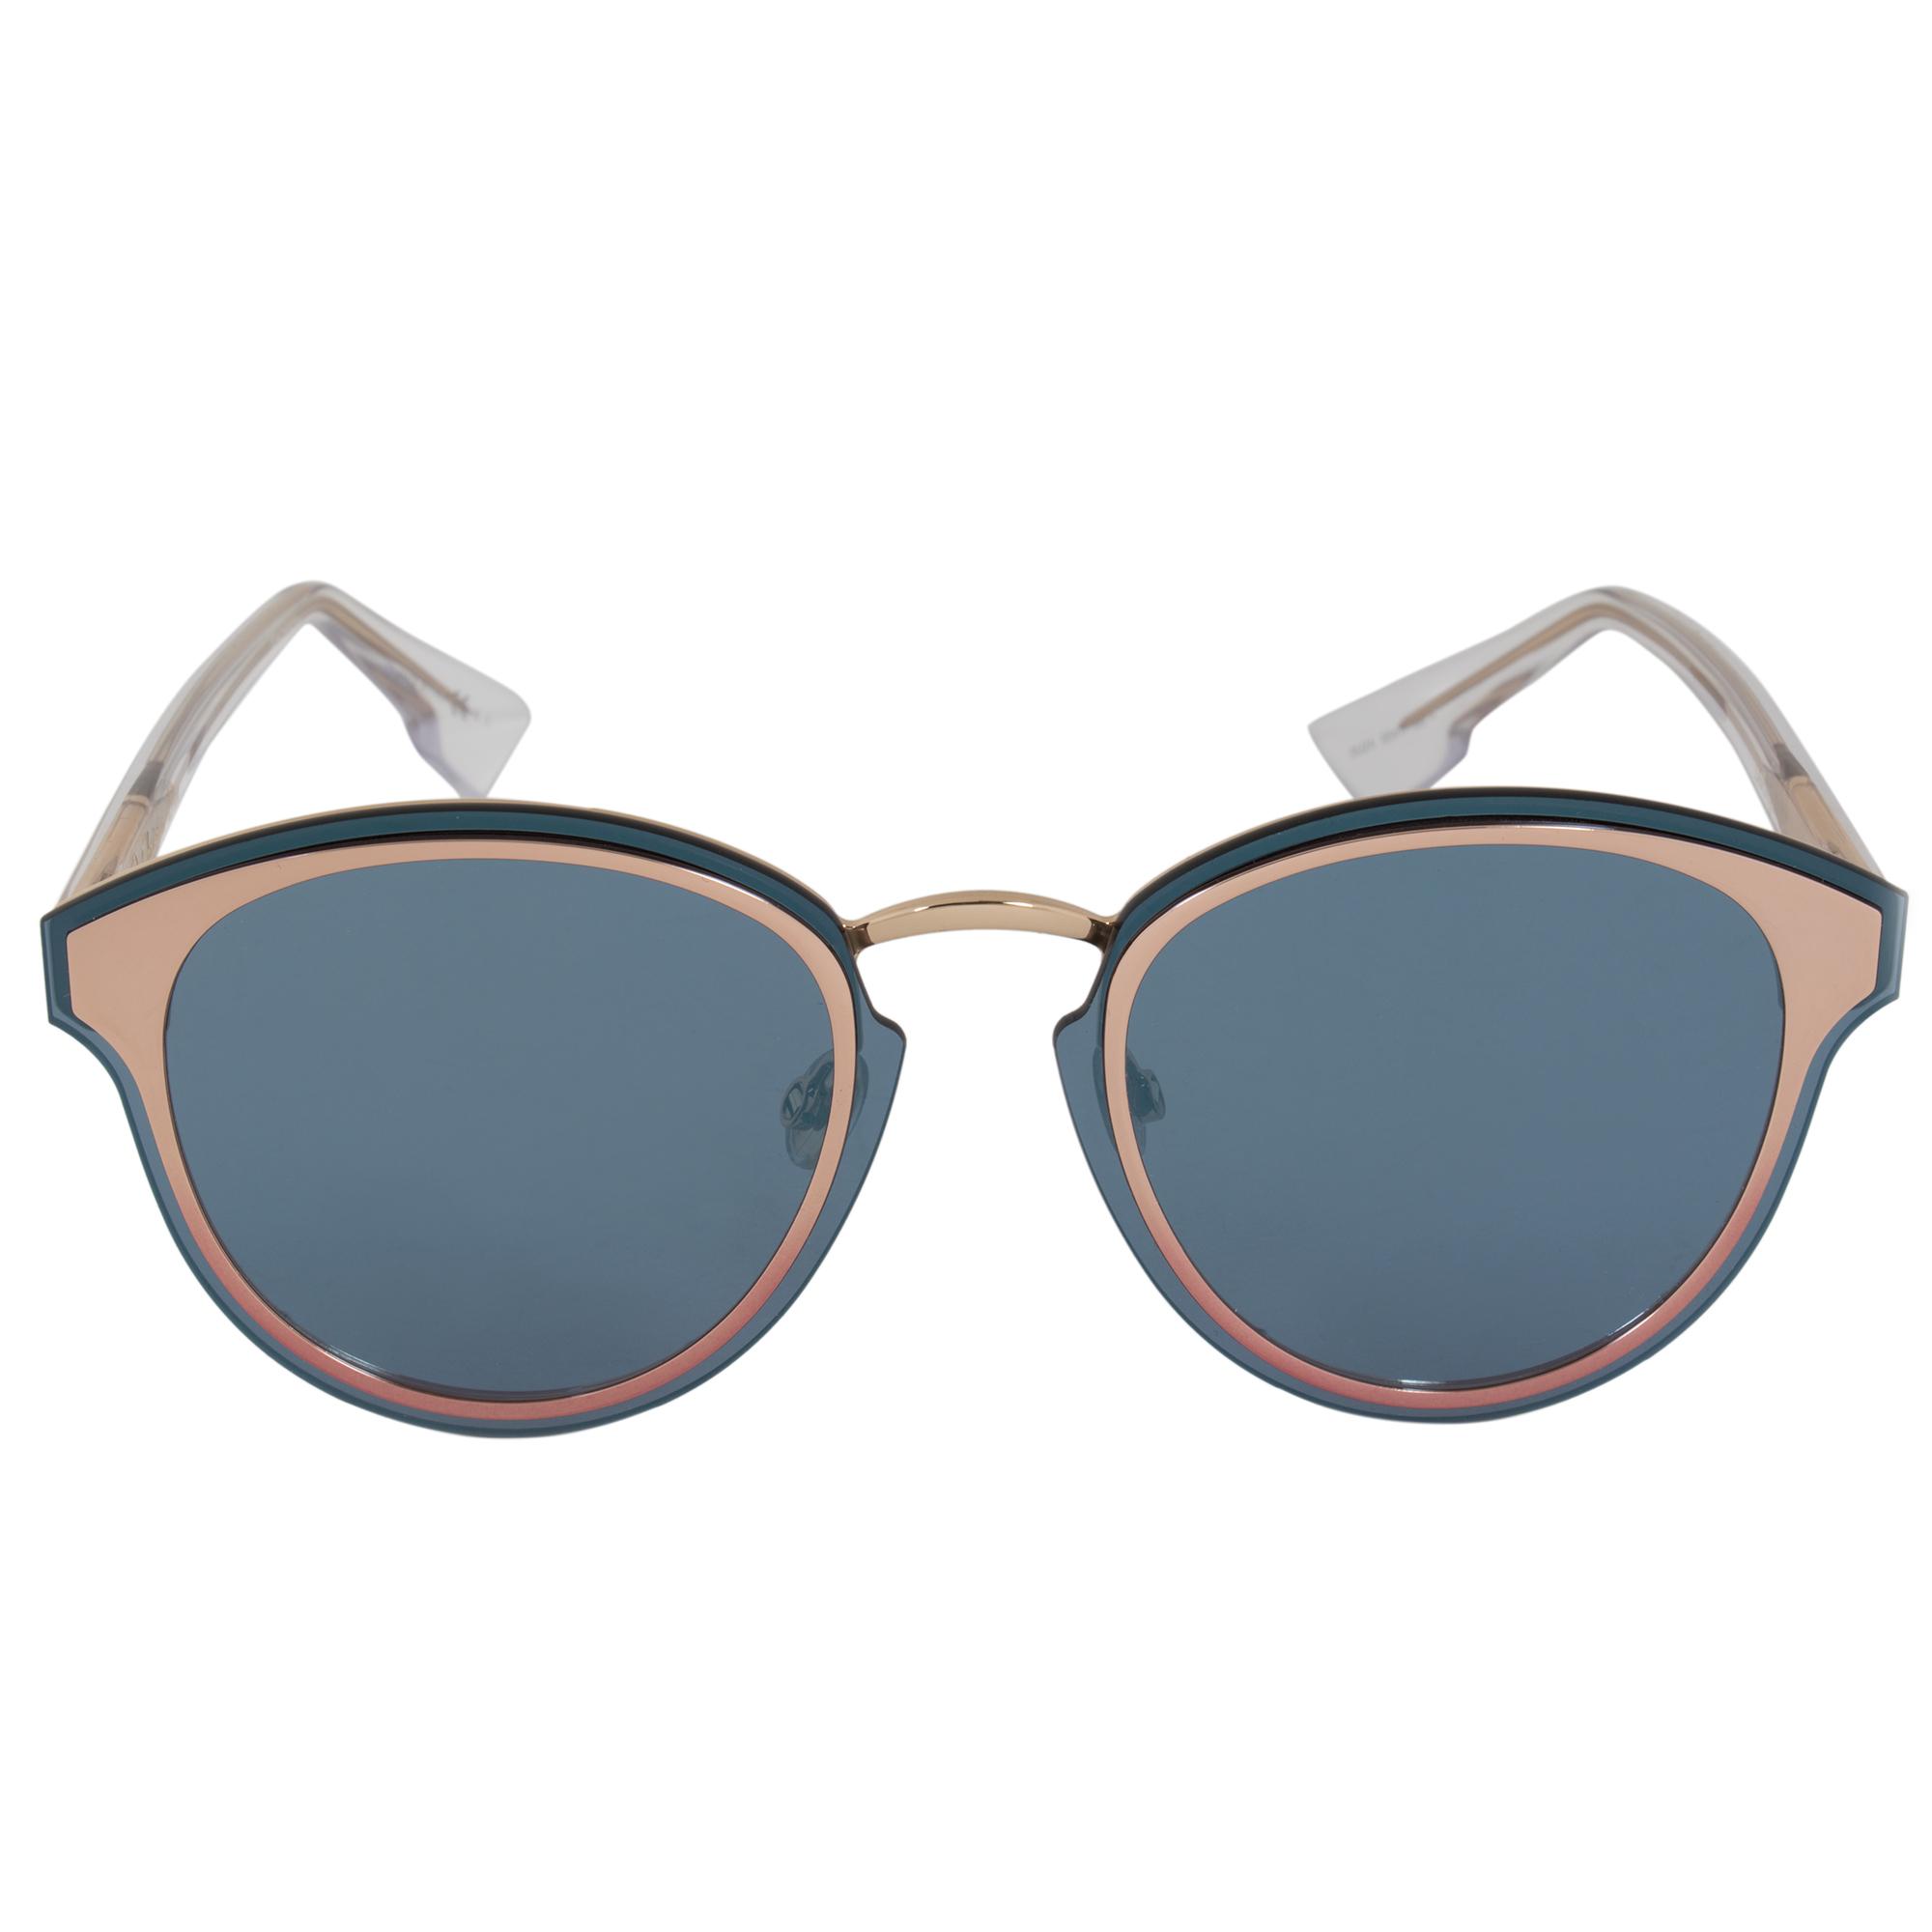 e1488d5e47775 Christian Dior Nightfall Sunglasses 35J2A 65